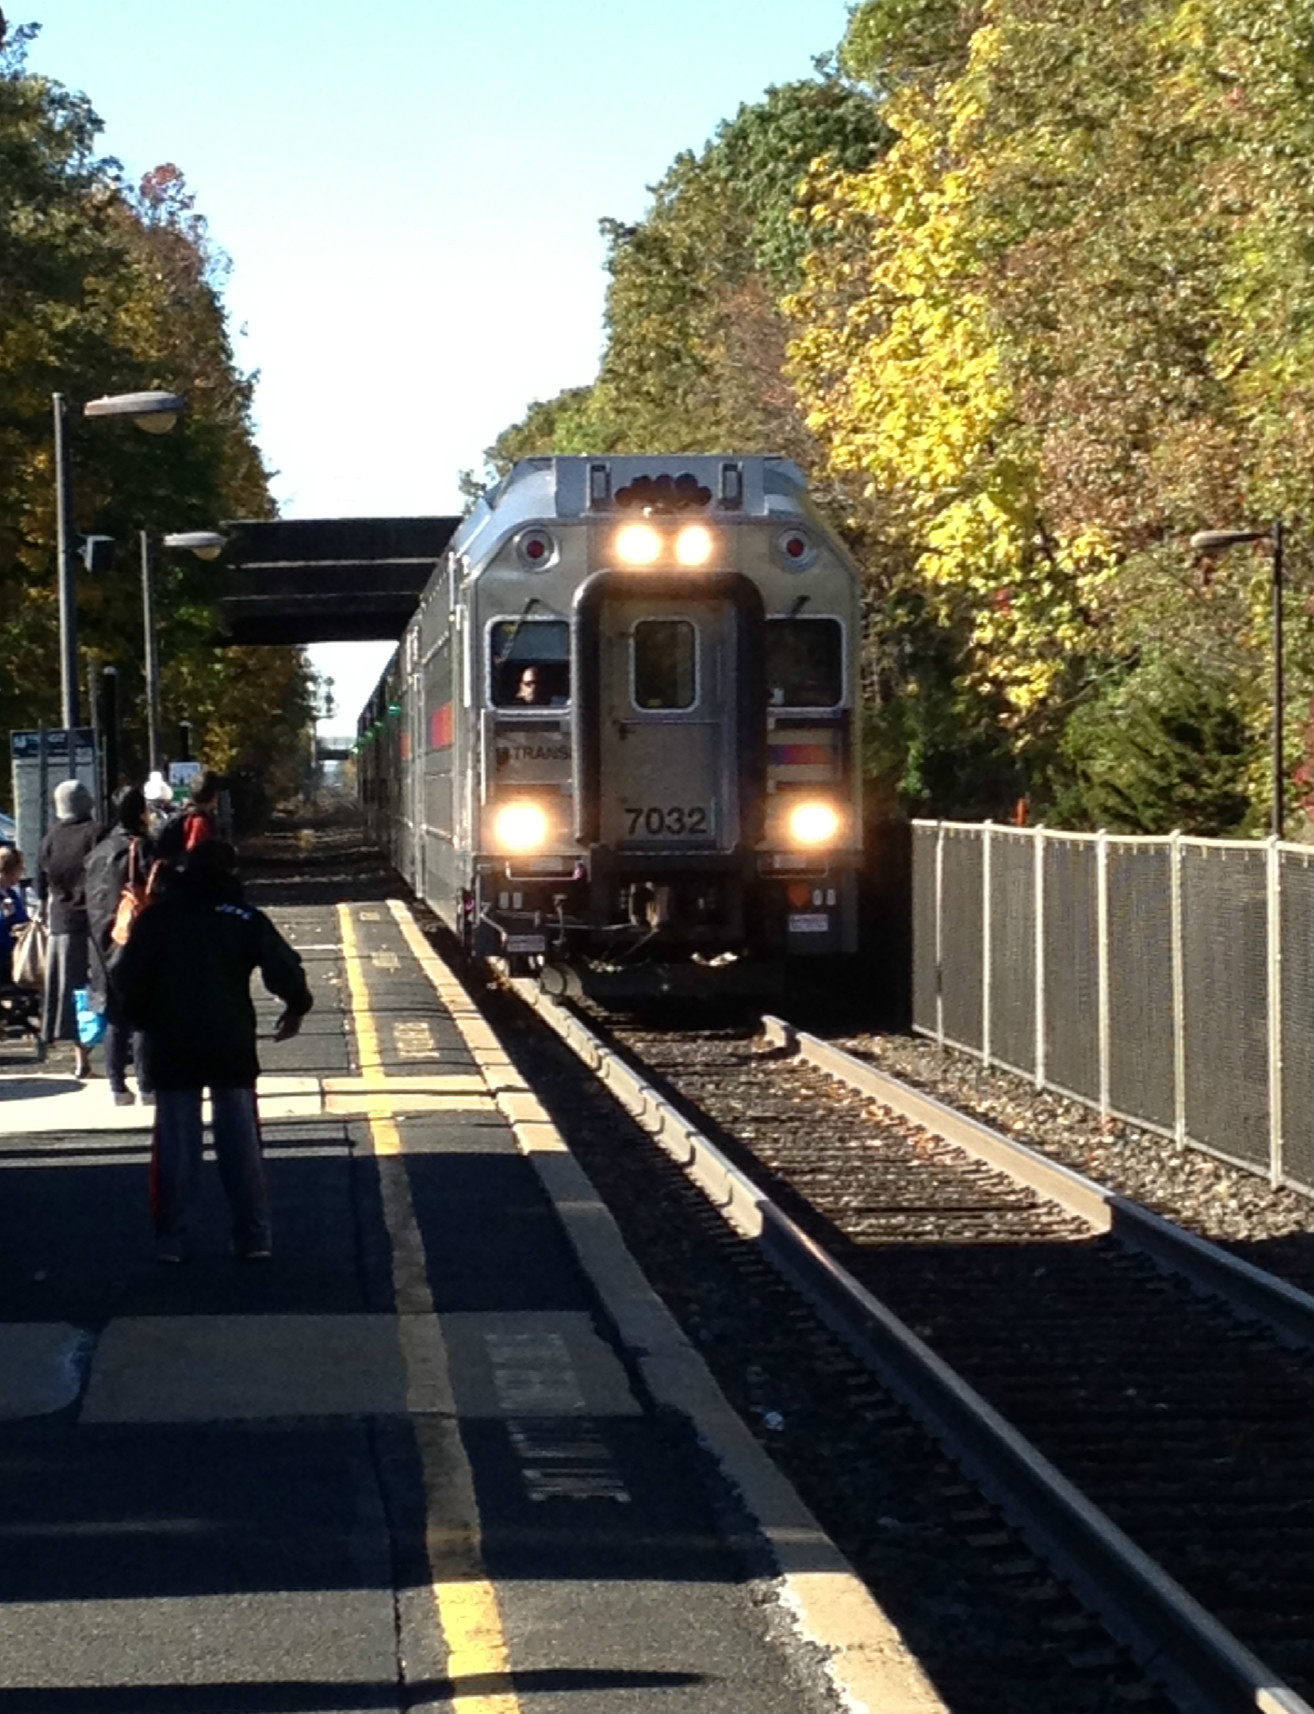 827d3f1ea2d2f8da4998_NJT_1016am_train_pulls_into_Fanwood_10-27-14.jpg